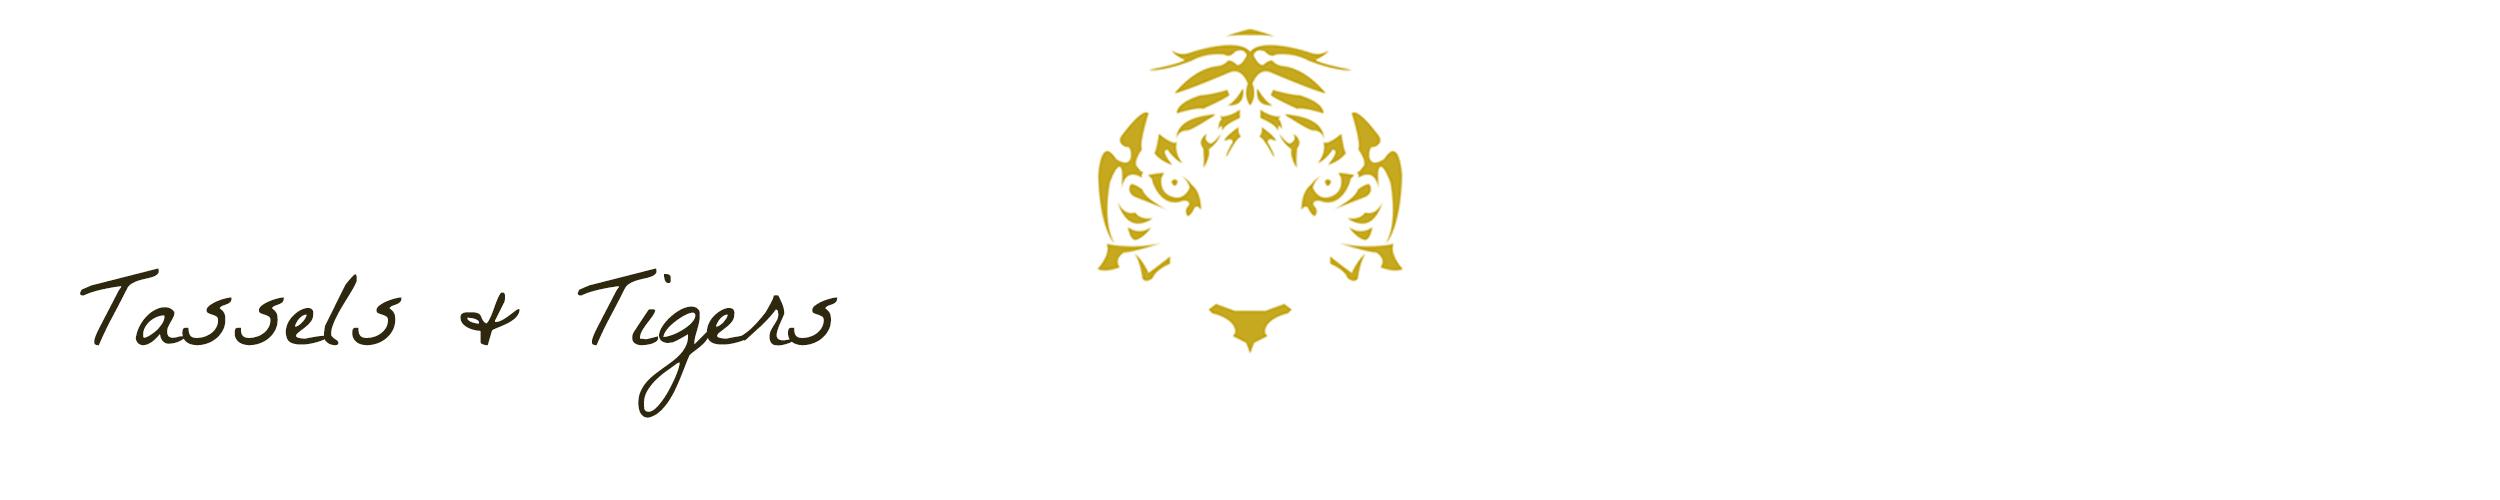 Tassels & Tigers Interiors Decor and Lifestyle Blog